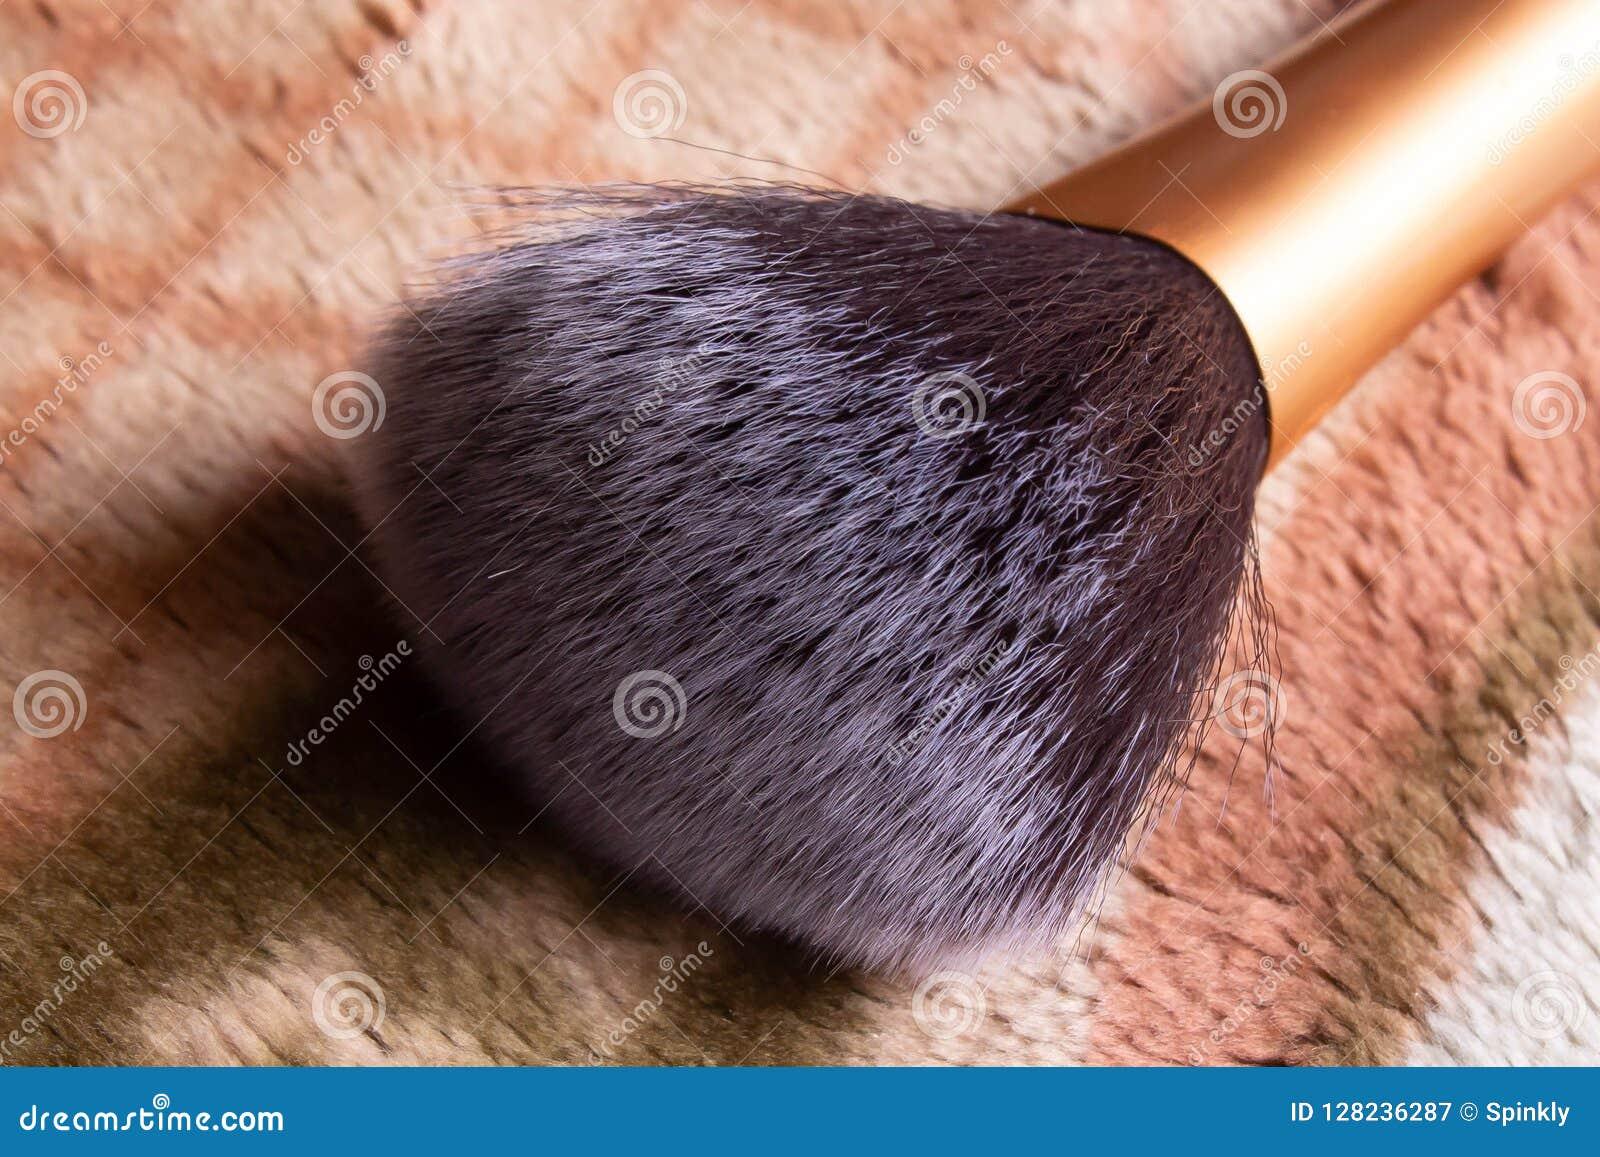 Close up image of makeup brush bristle